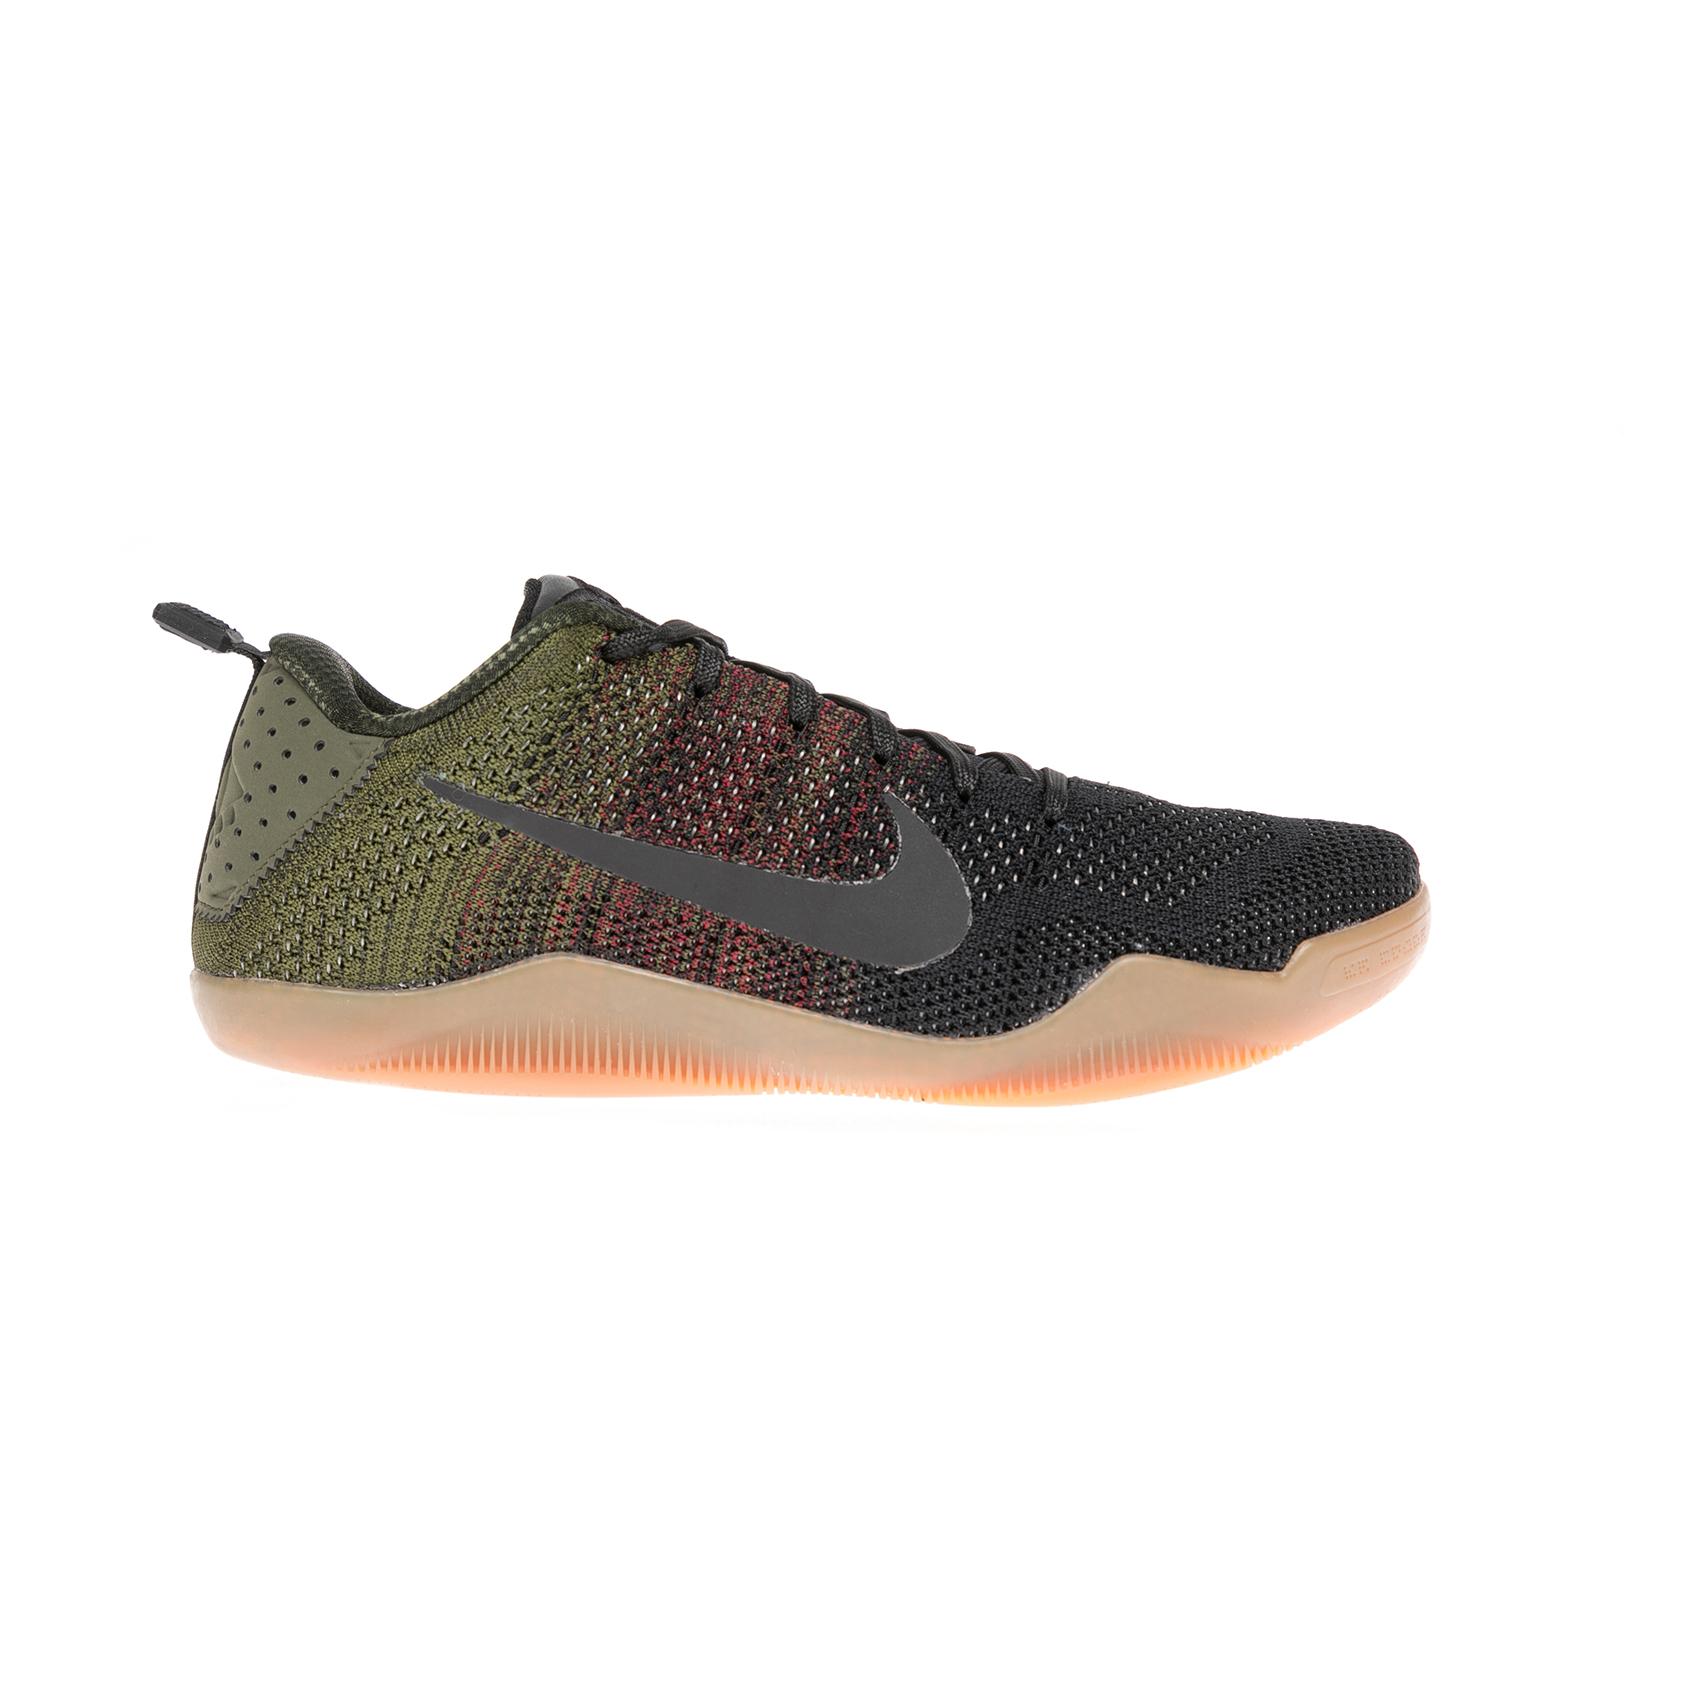 NIKE – Ανδρικά παπούτσια NIKE KOBE XI ELITE LOW 4KB πολύχρωμα